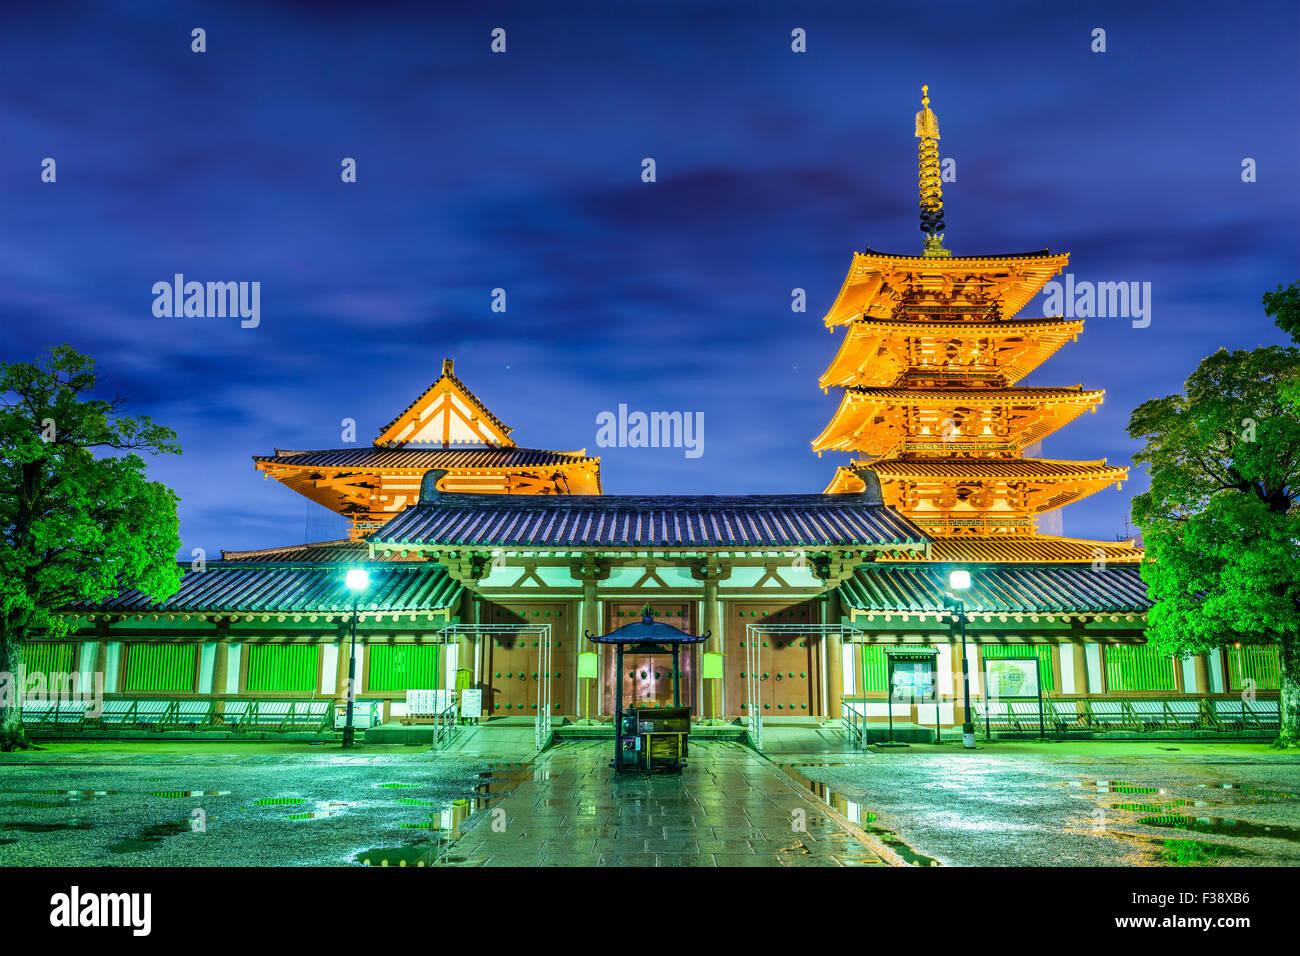 Templo Shitennoji en Osaka, Japón. Imagen De Stock